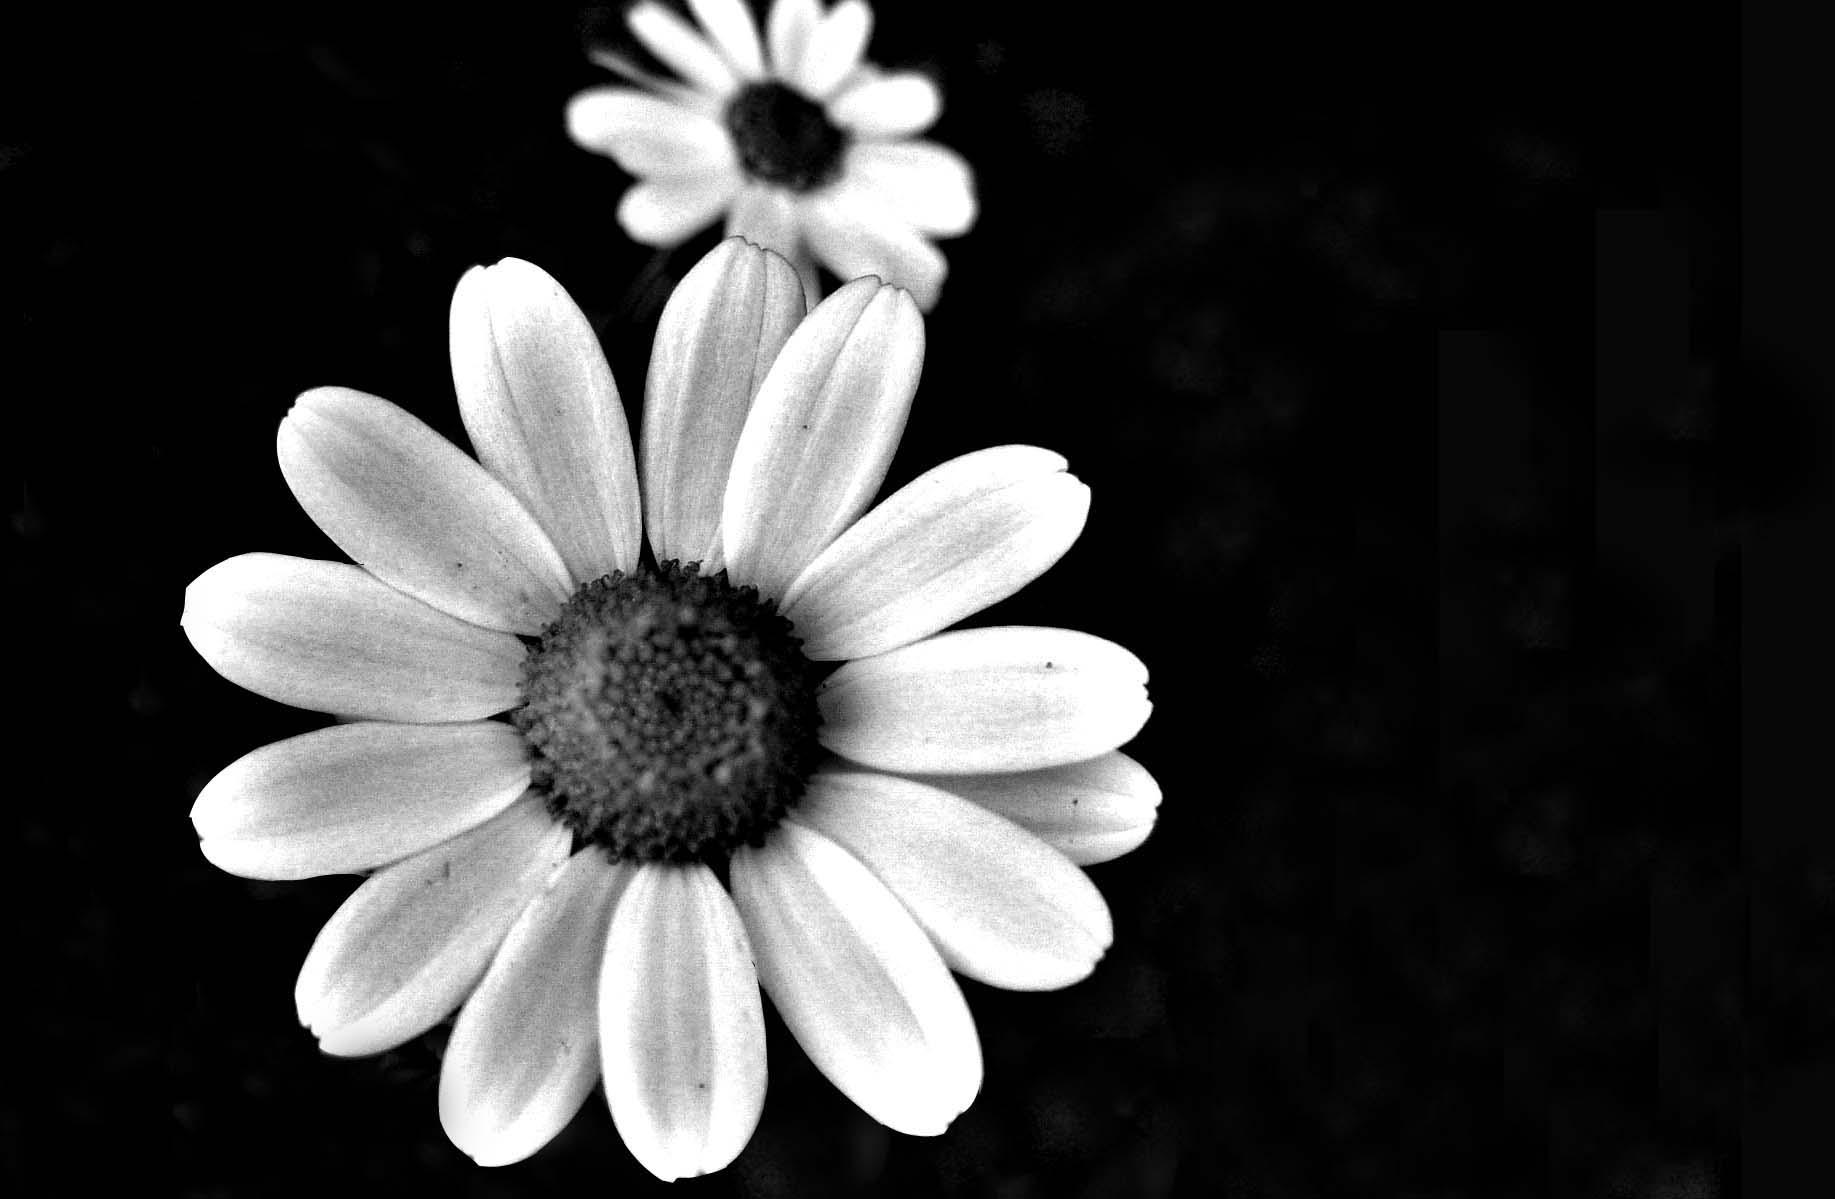 Black flowers hd 17 desktop background hdflowerwallpaper black flowers hd 17 desktop background mightylinksfo